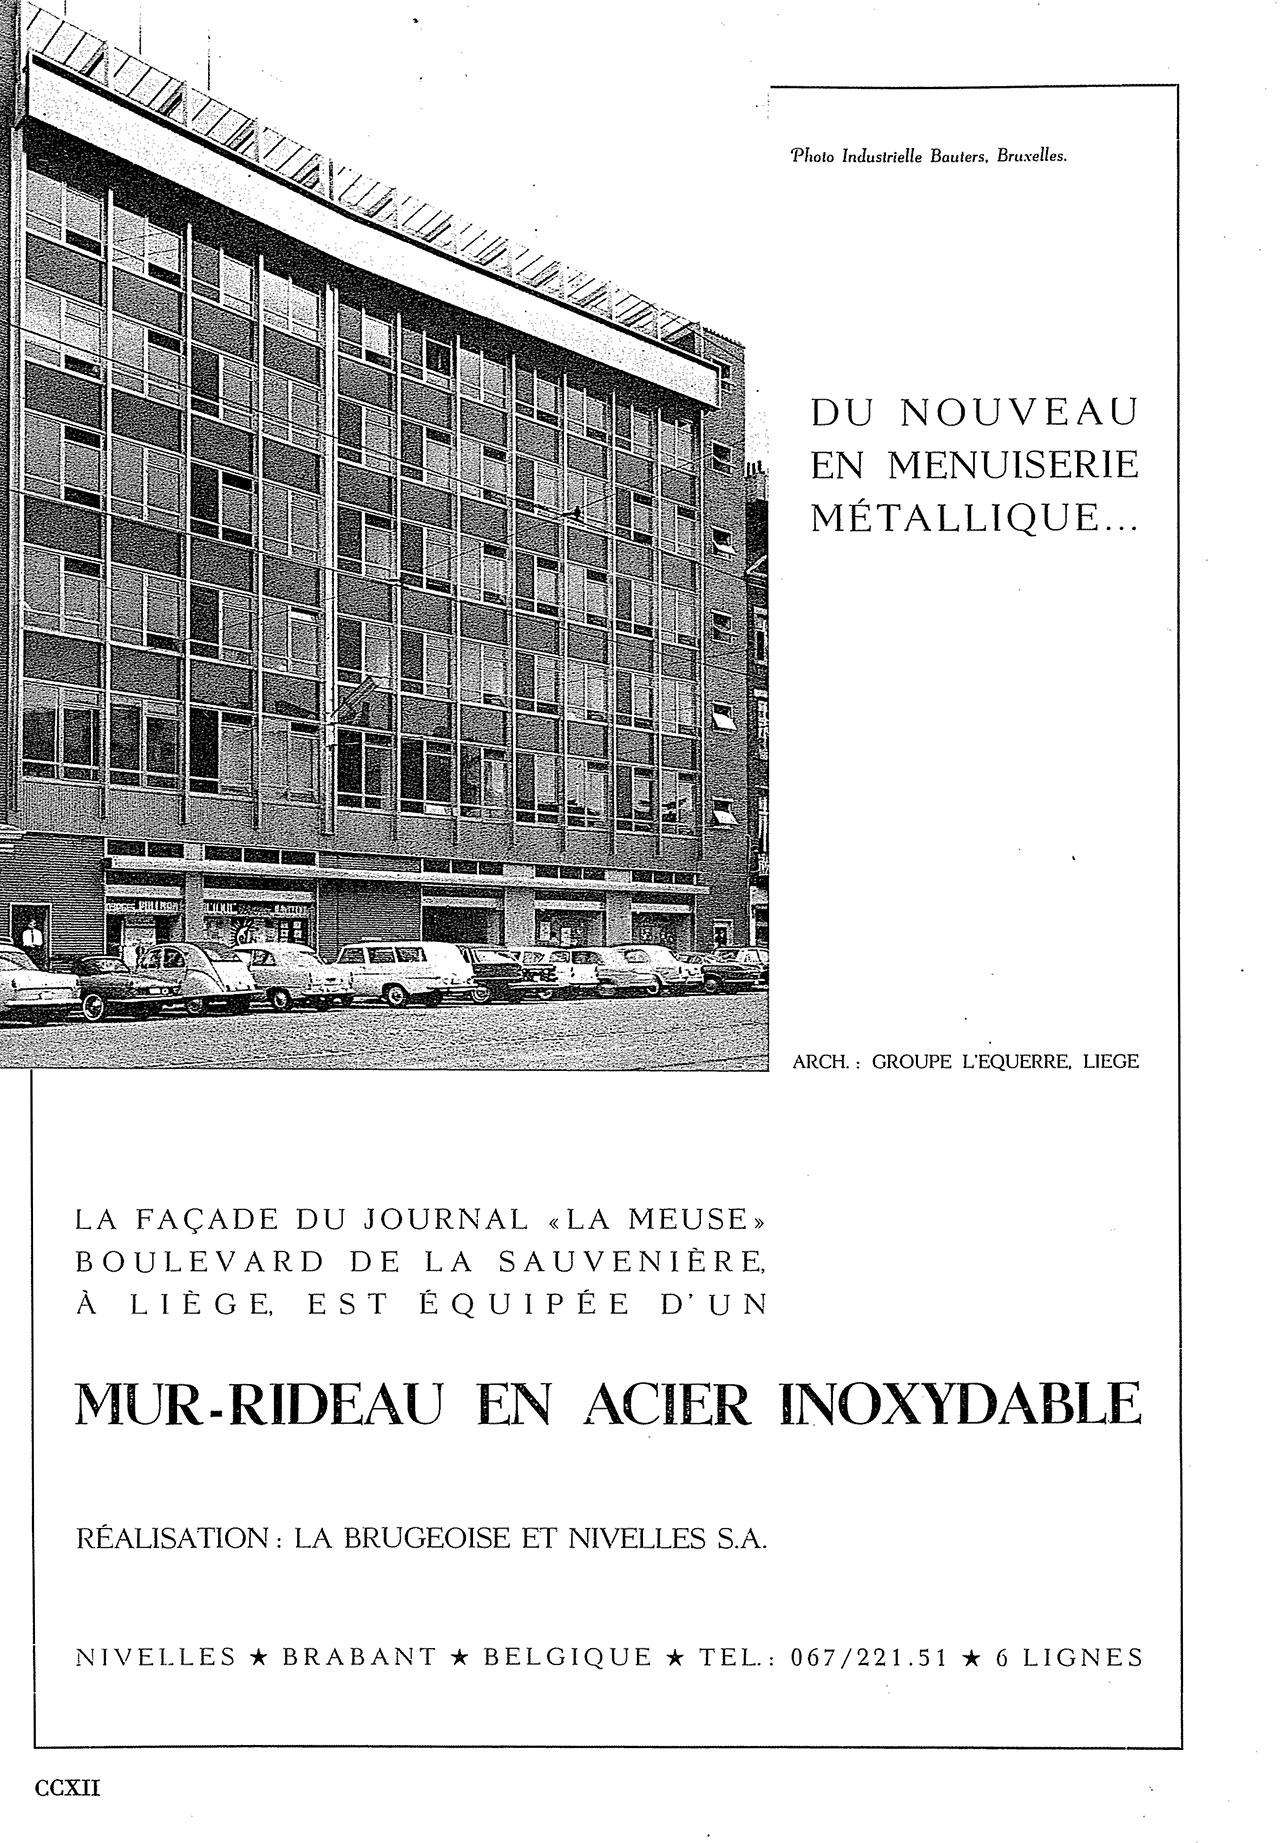 Mur-Rideau En Acier Inoxydable